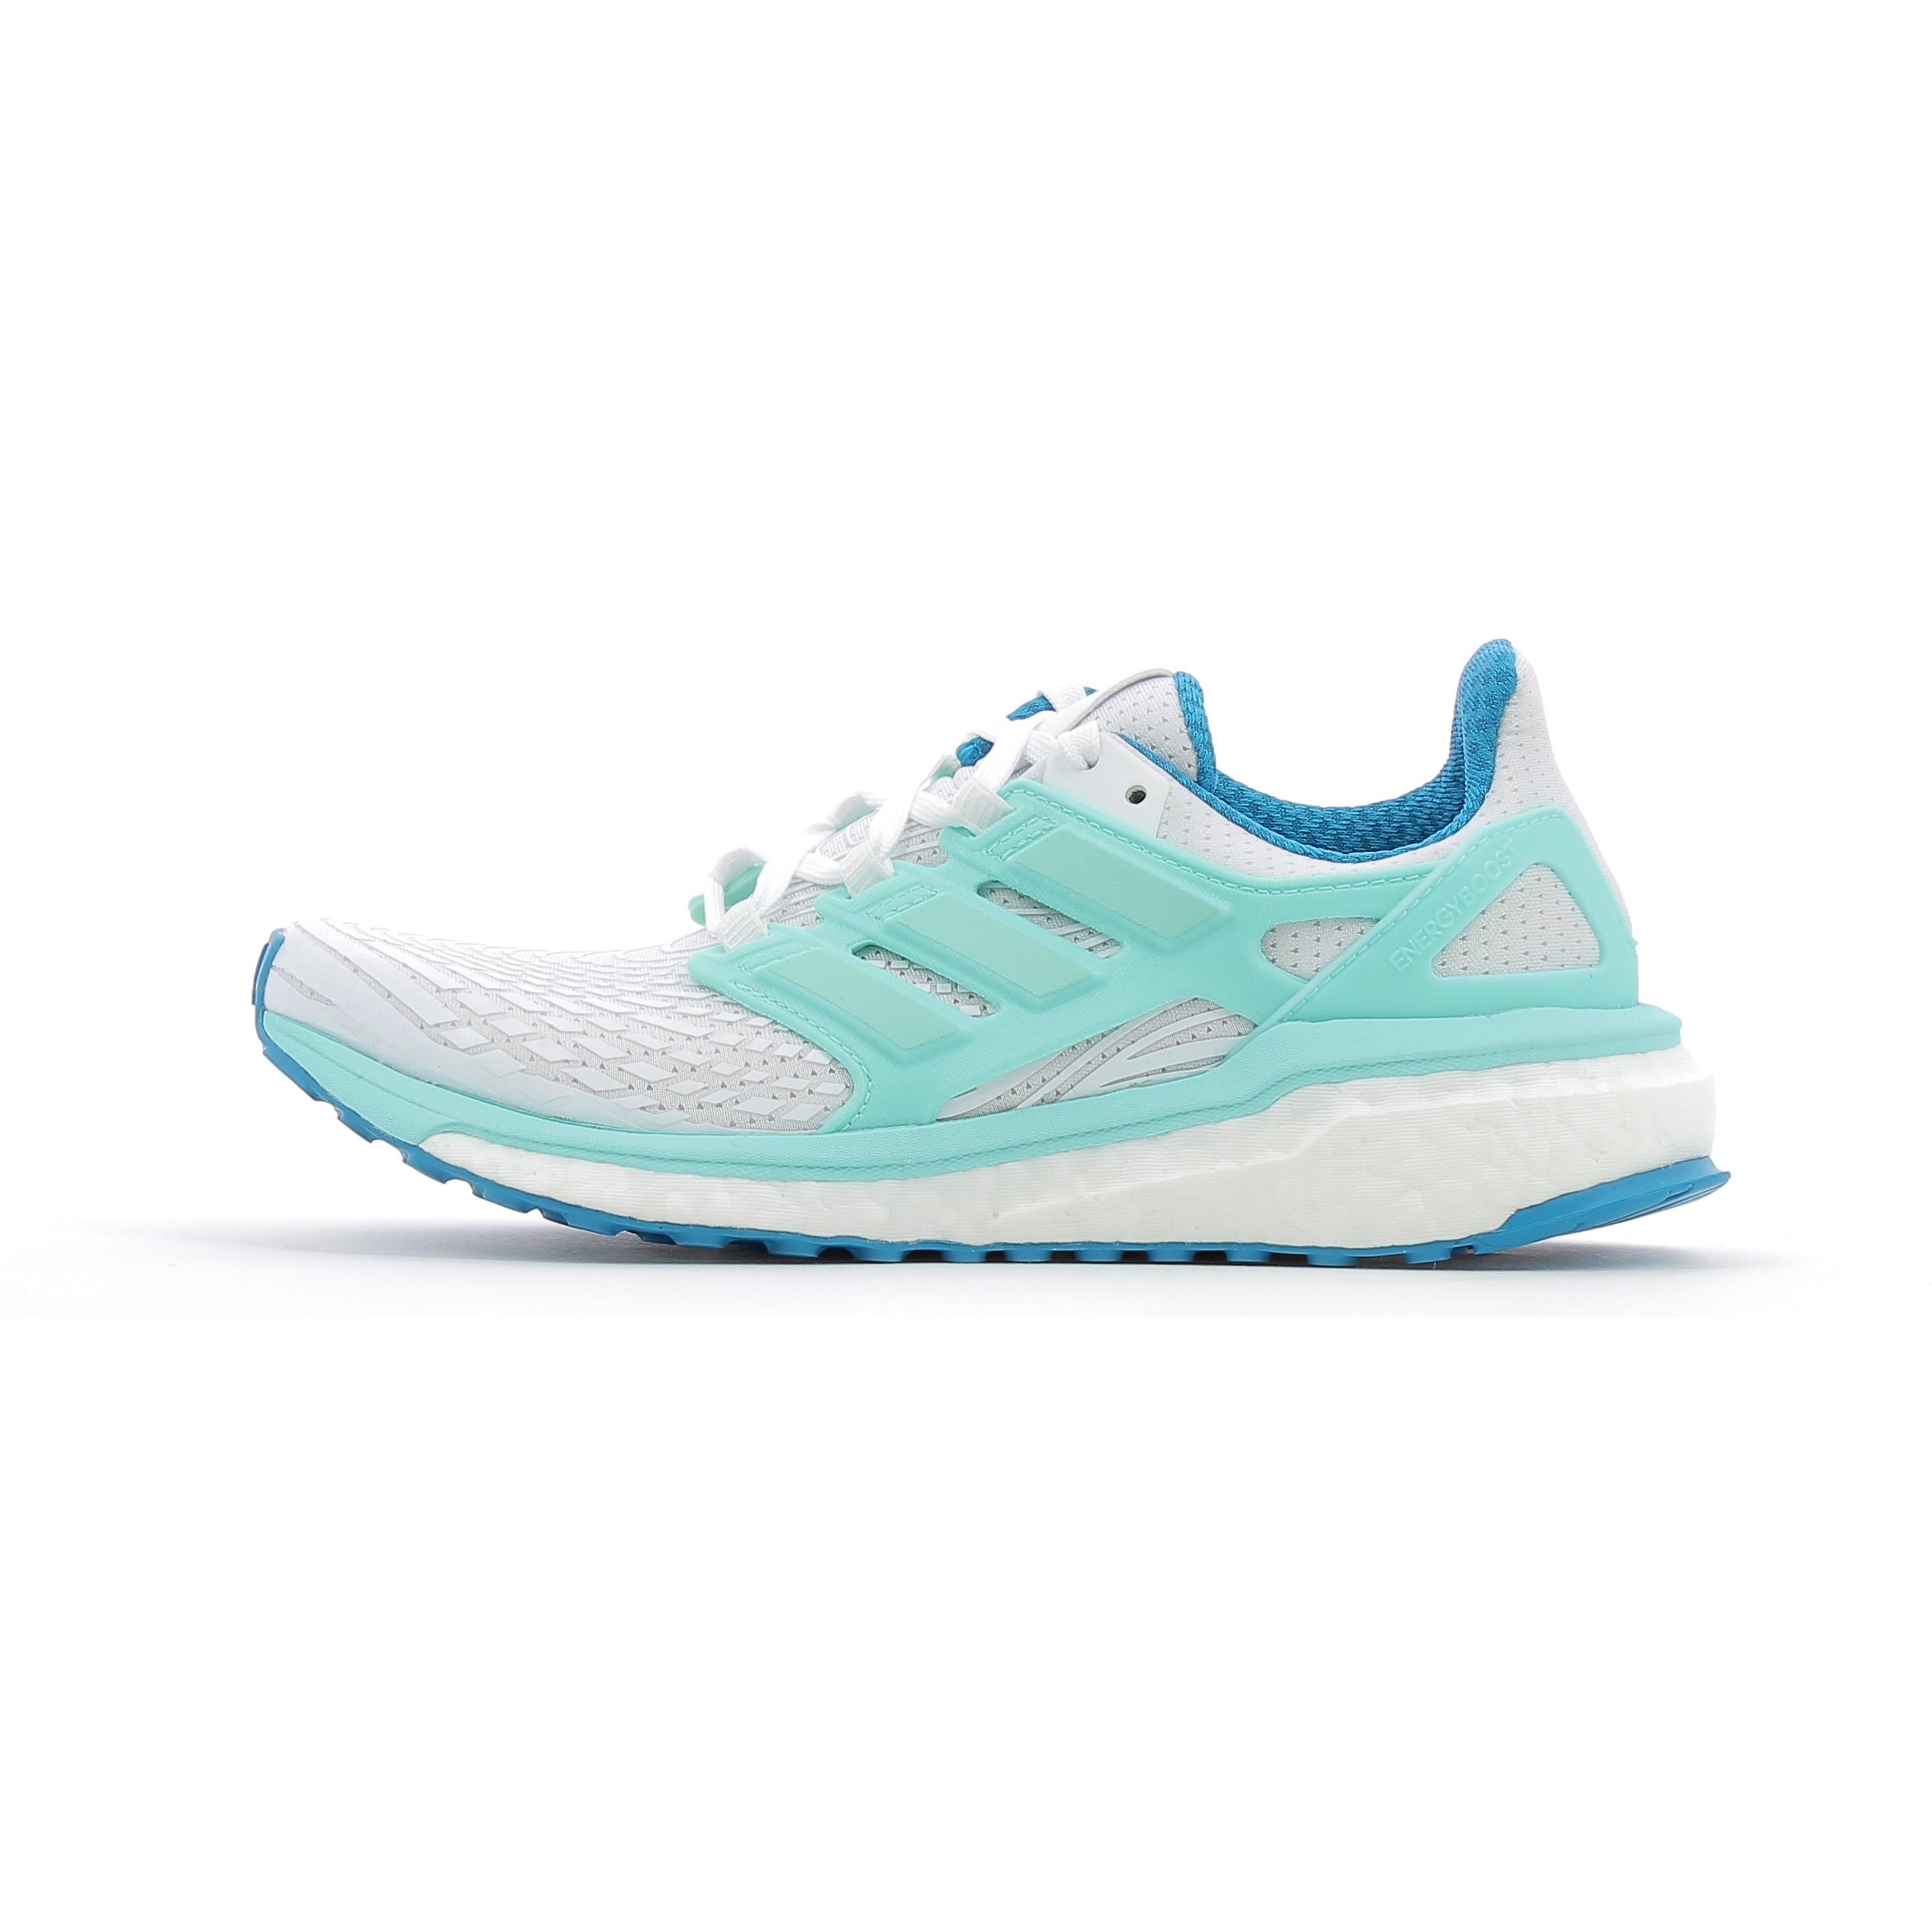 premium selection d8687 2b397 Chaussures de running Adidas Performance Energy Boost W